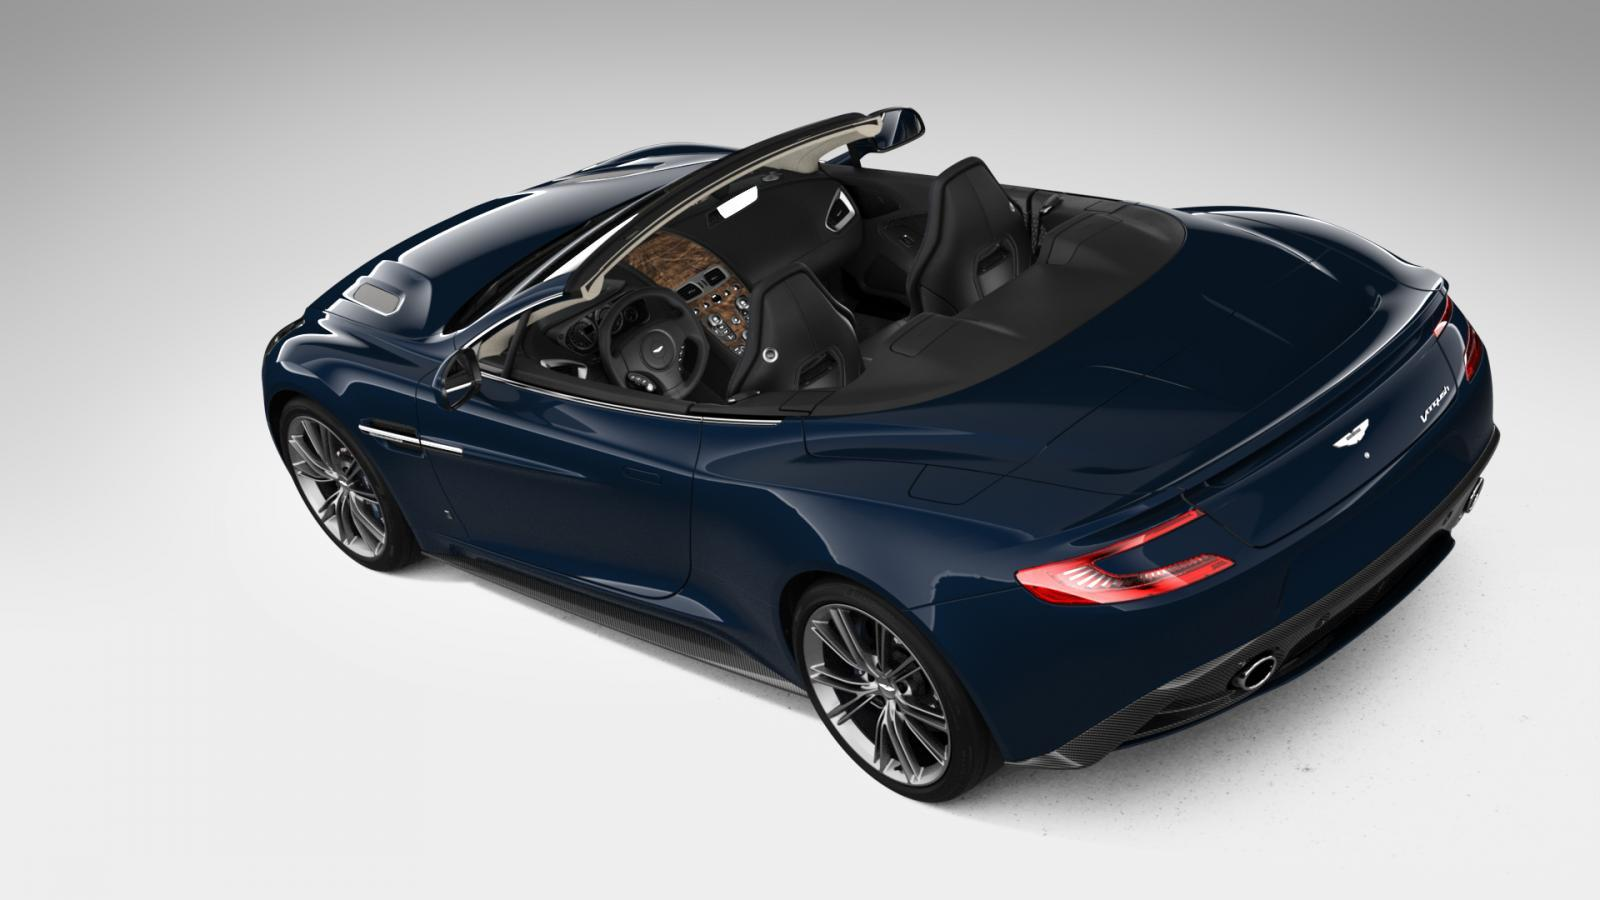 Aston Martin Vanquish Volante Neiman Marcus Edition 1 6